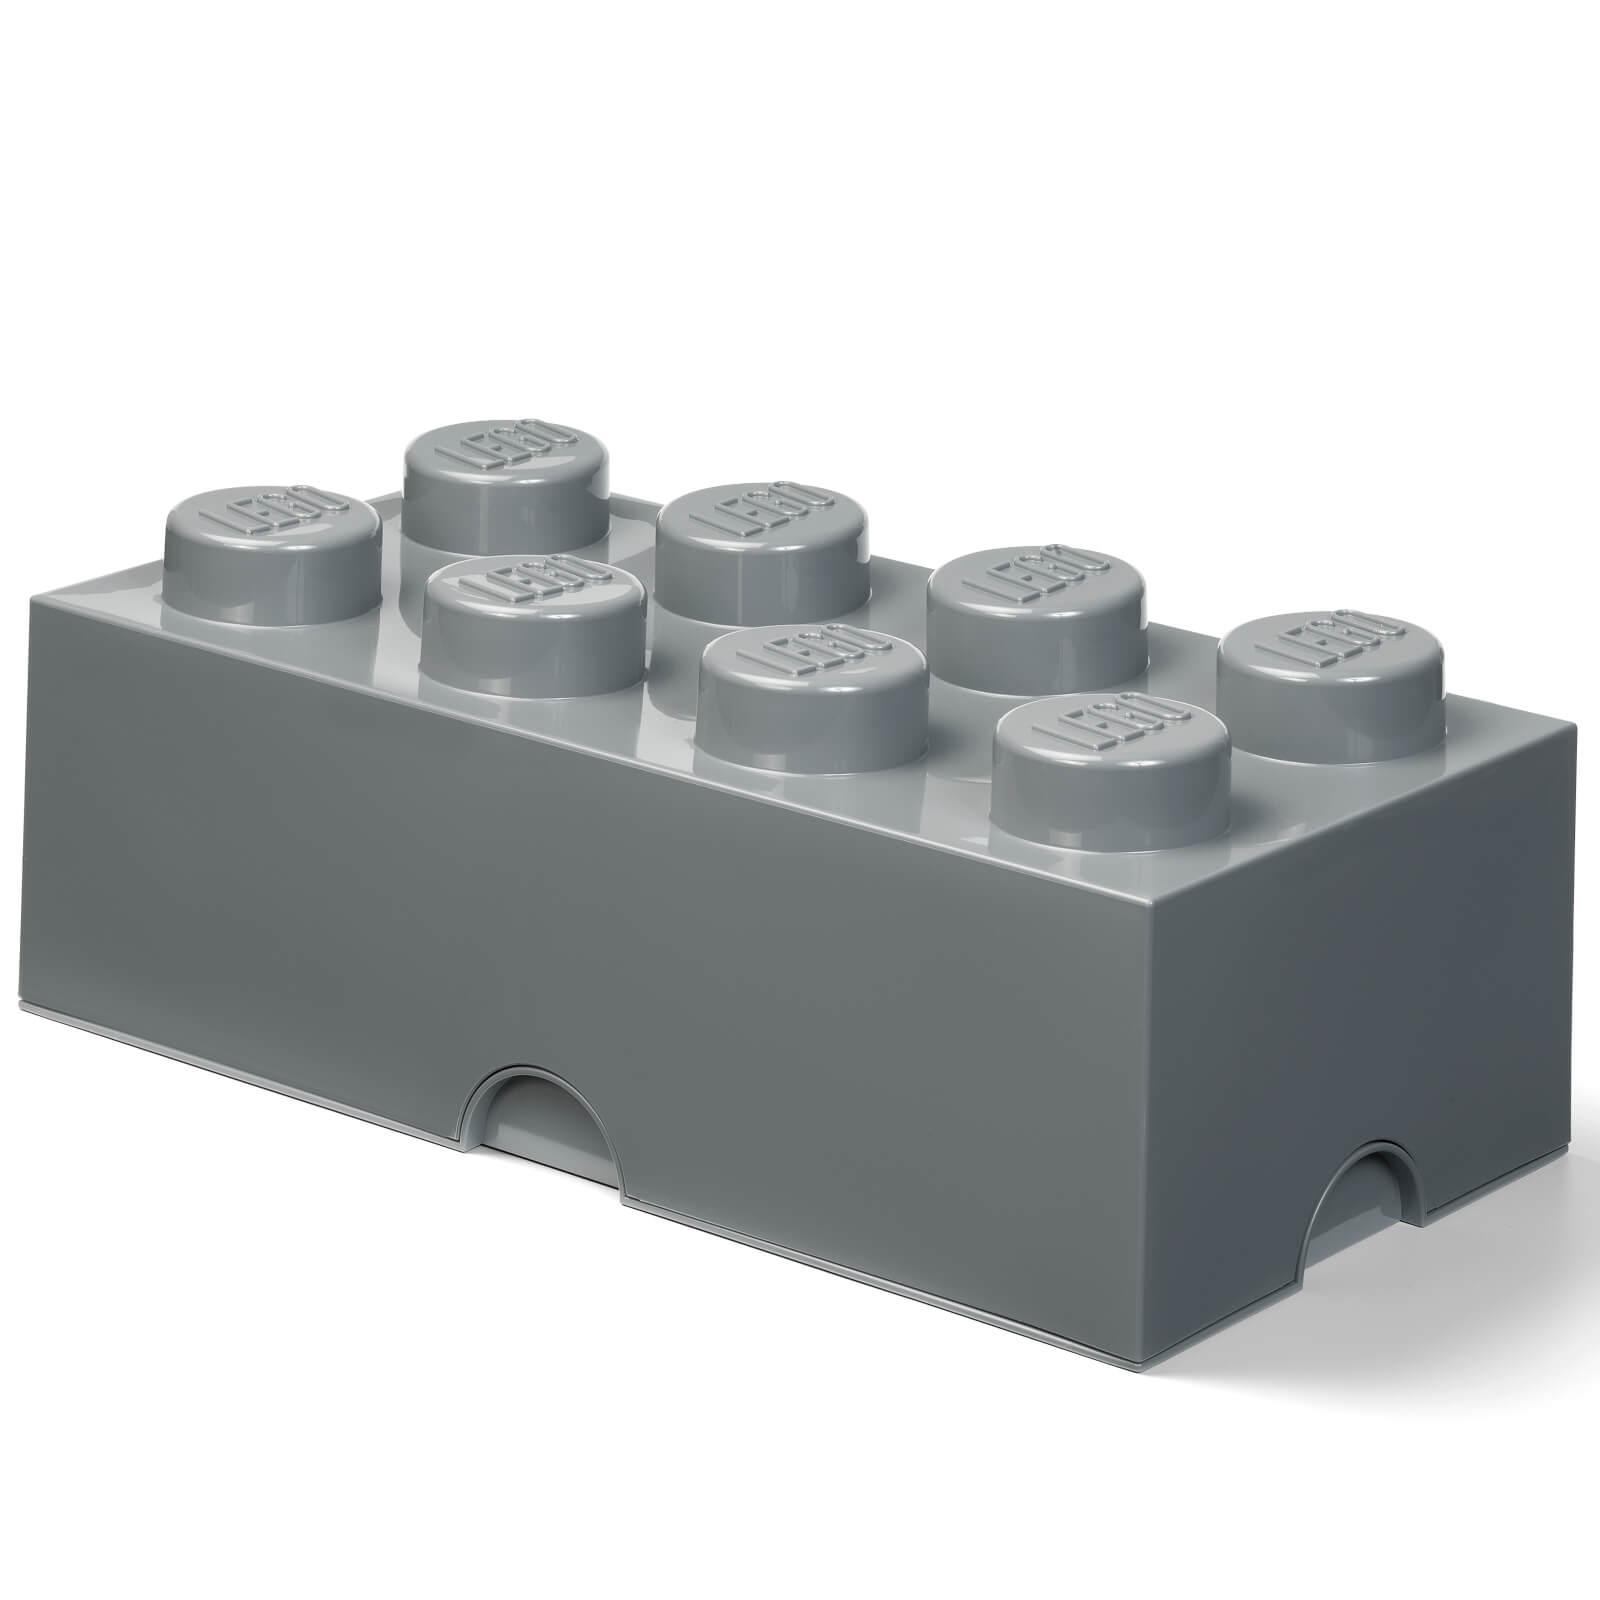 LEGO Storage Brick 8 - Dark Grey